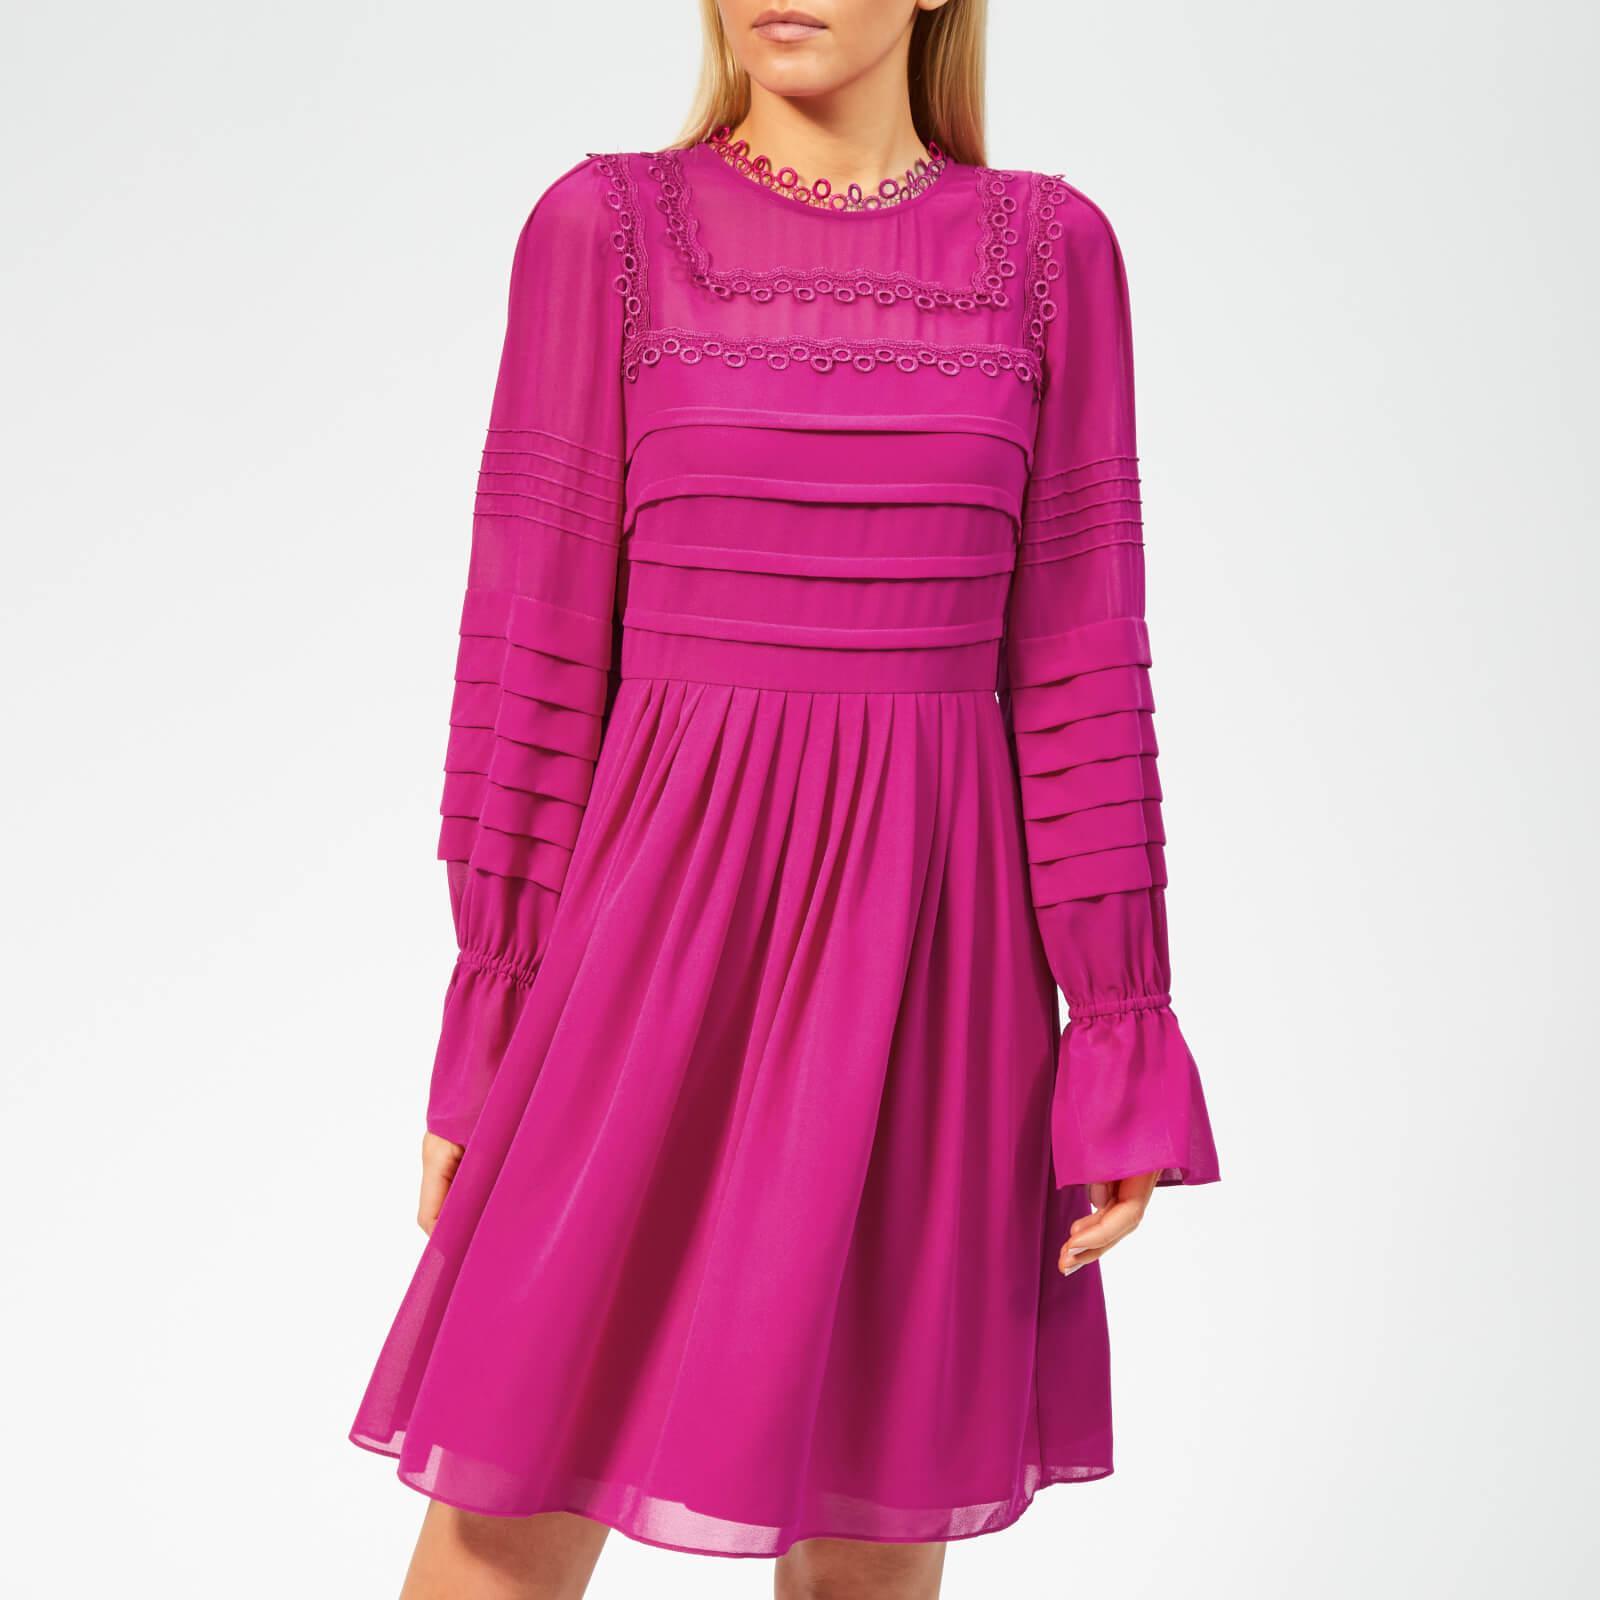 fa7edd49e54 Ted Baker Arrebel Lace Trim Volume Sleeve Dress in Pink - Lyst